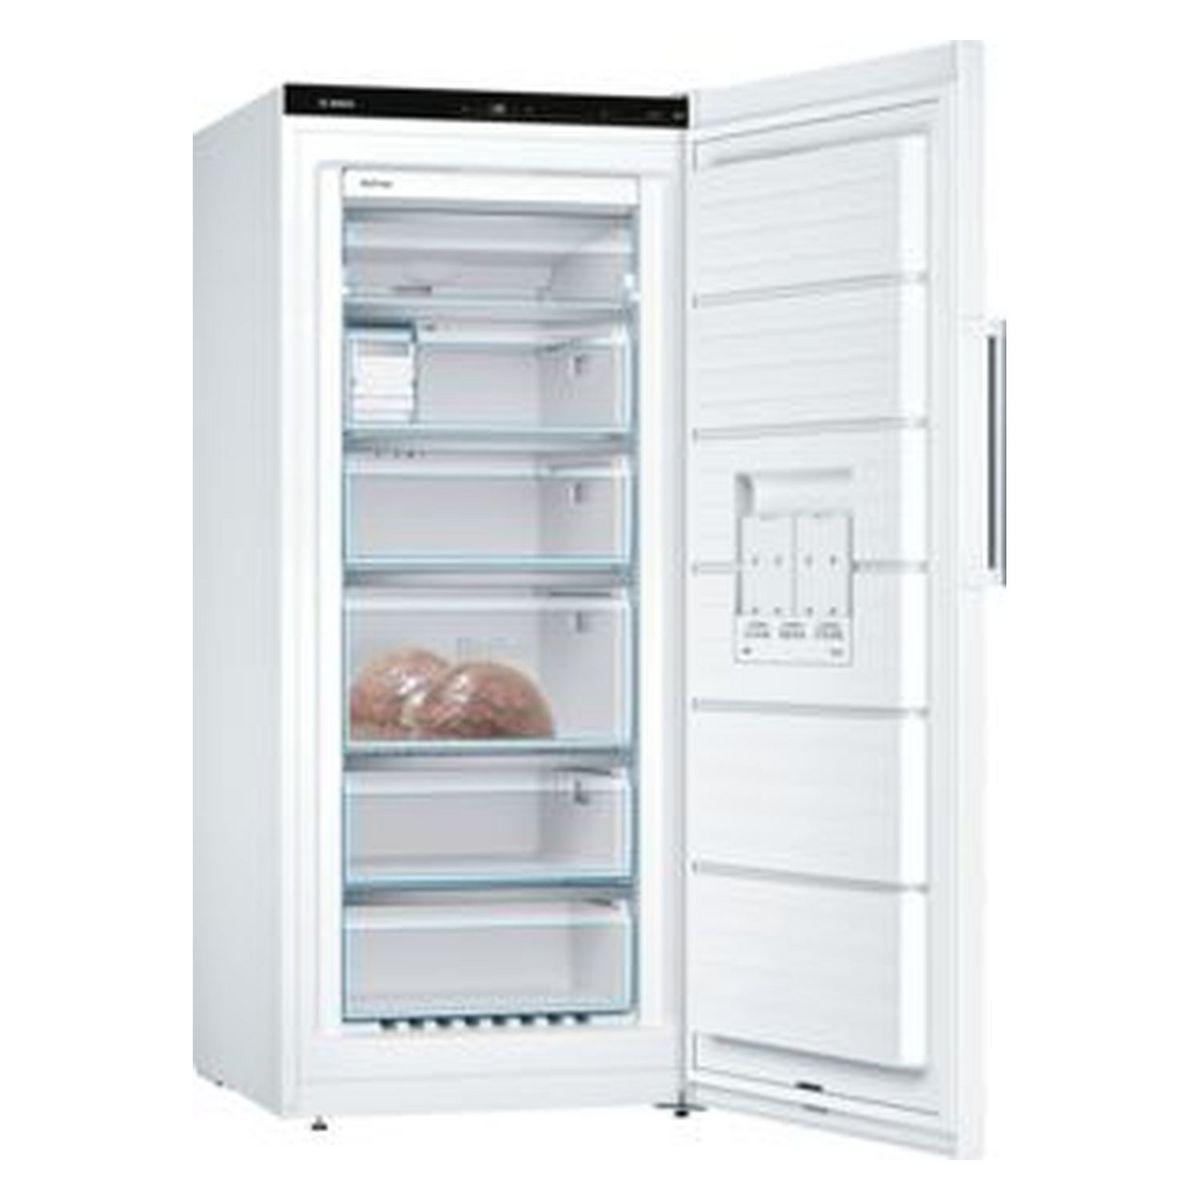 Congélateur armoire GSN51AWDV, 289 L, Froid no Frost